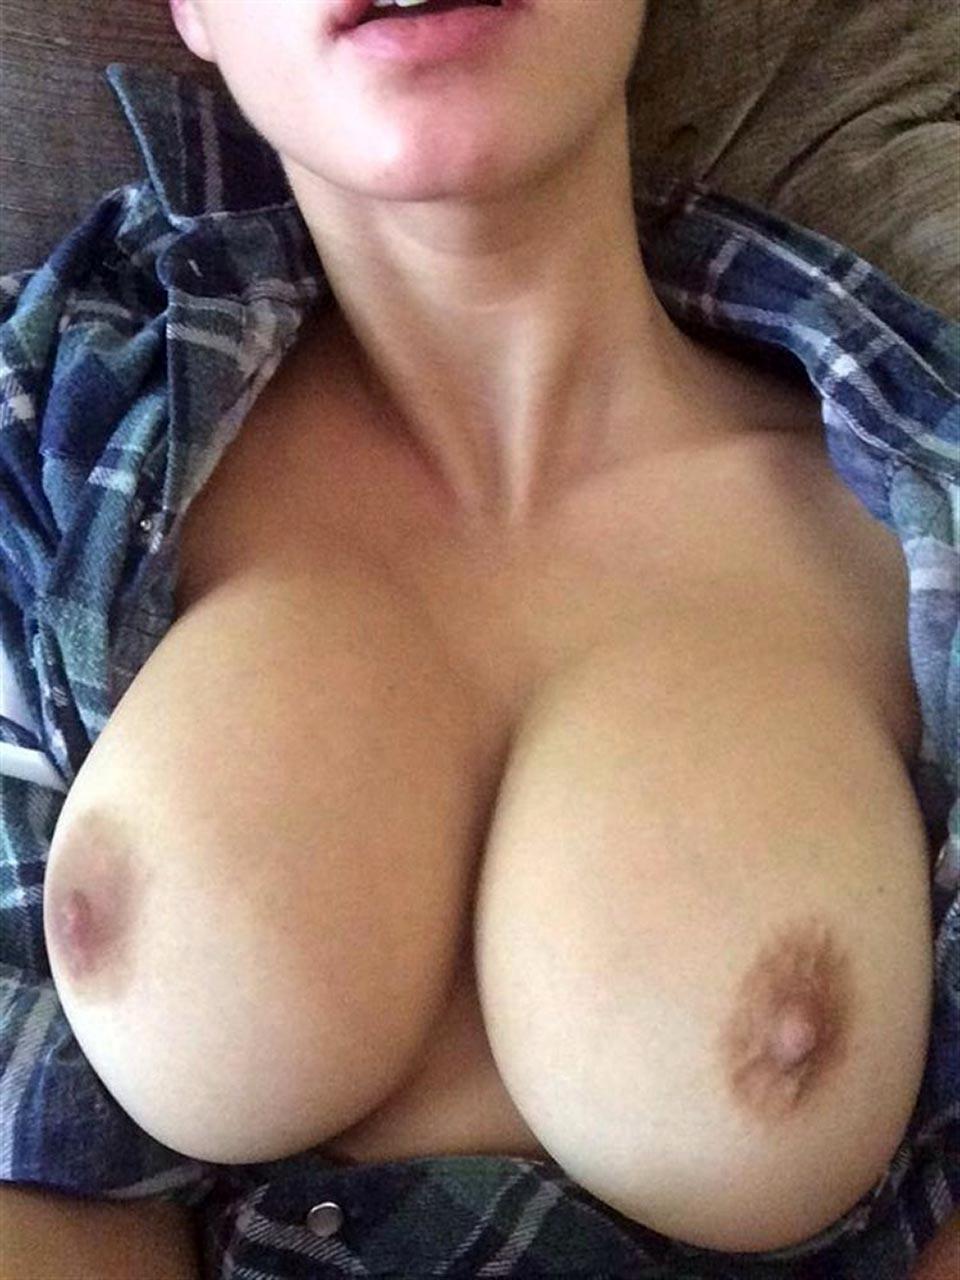 alyssa arce naked video